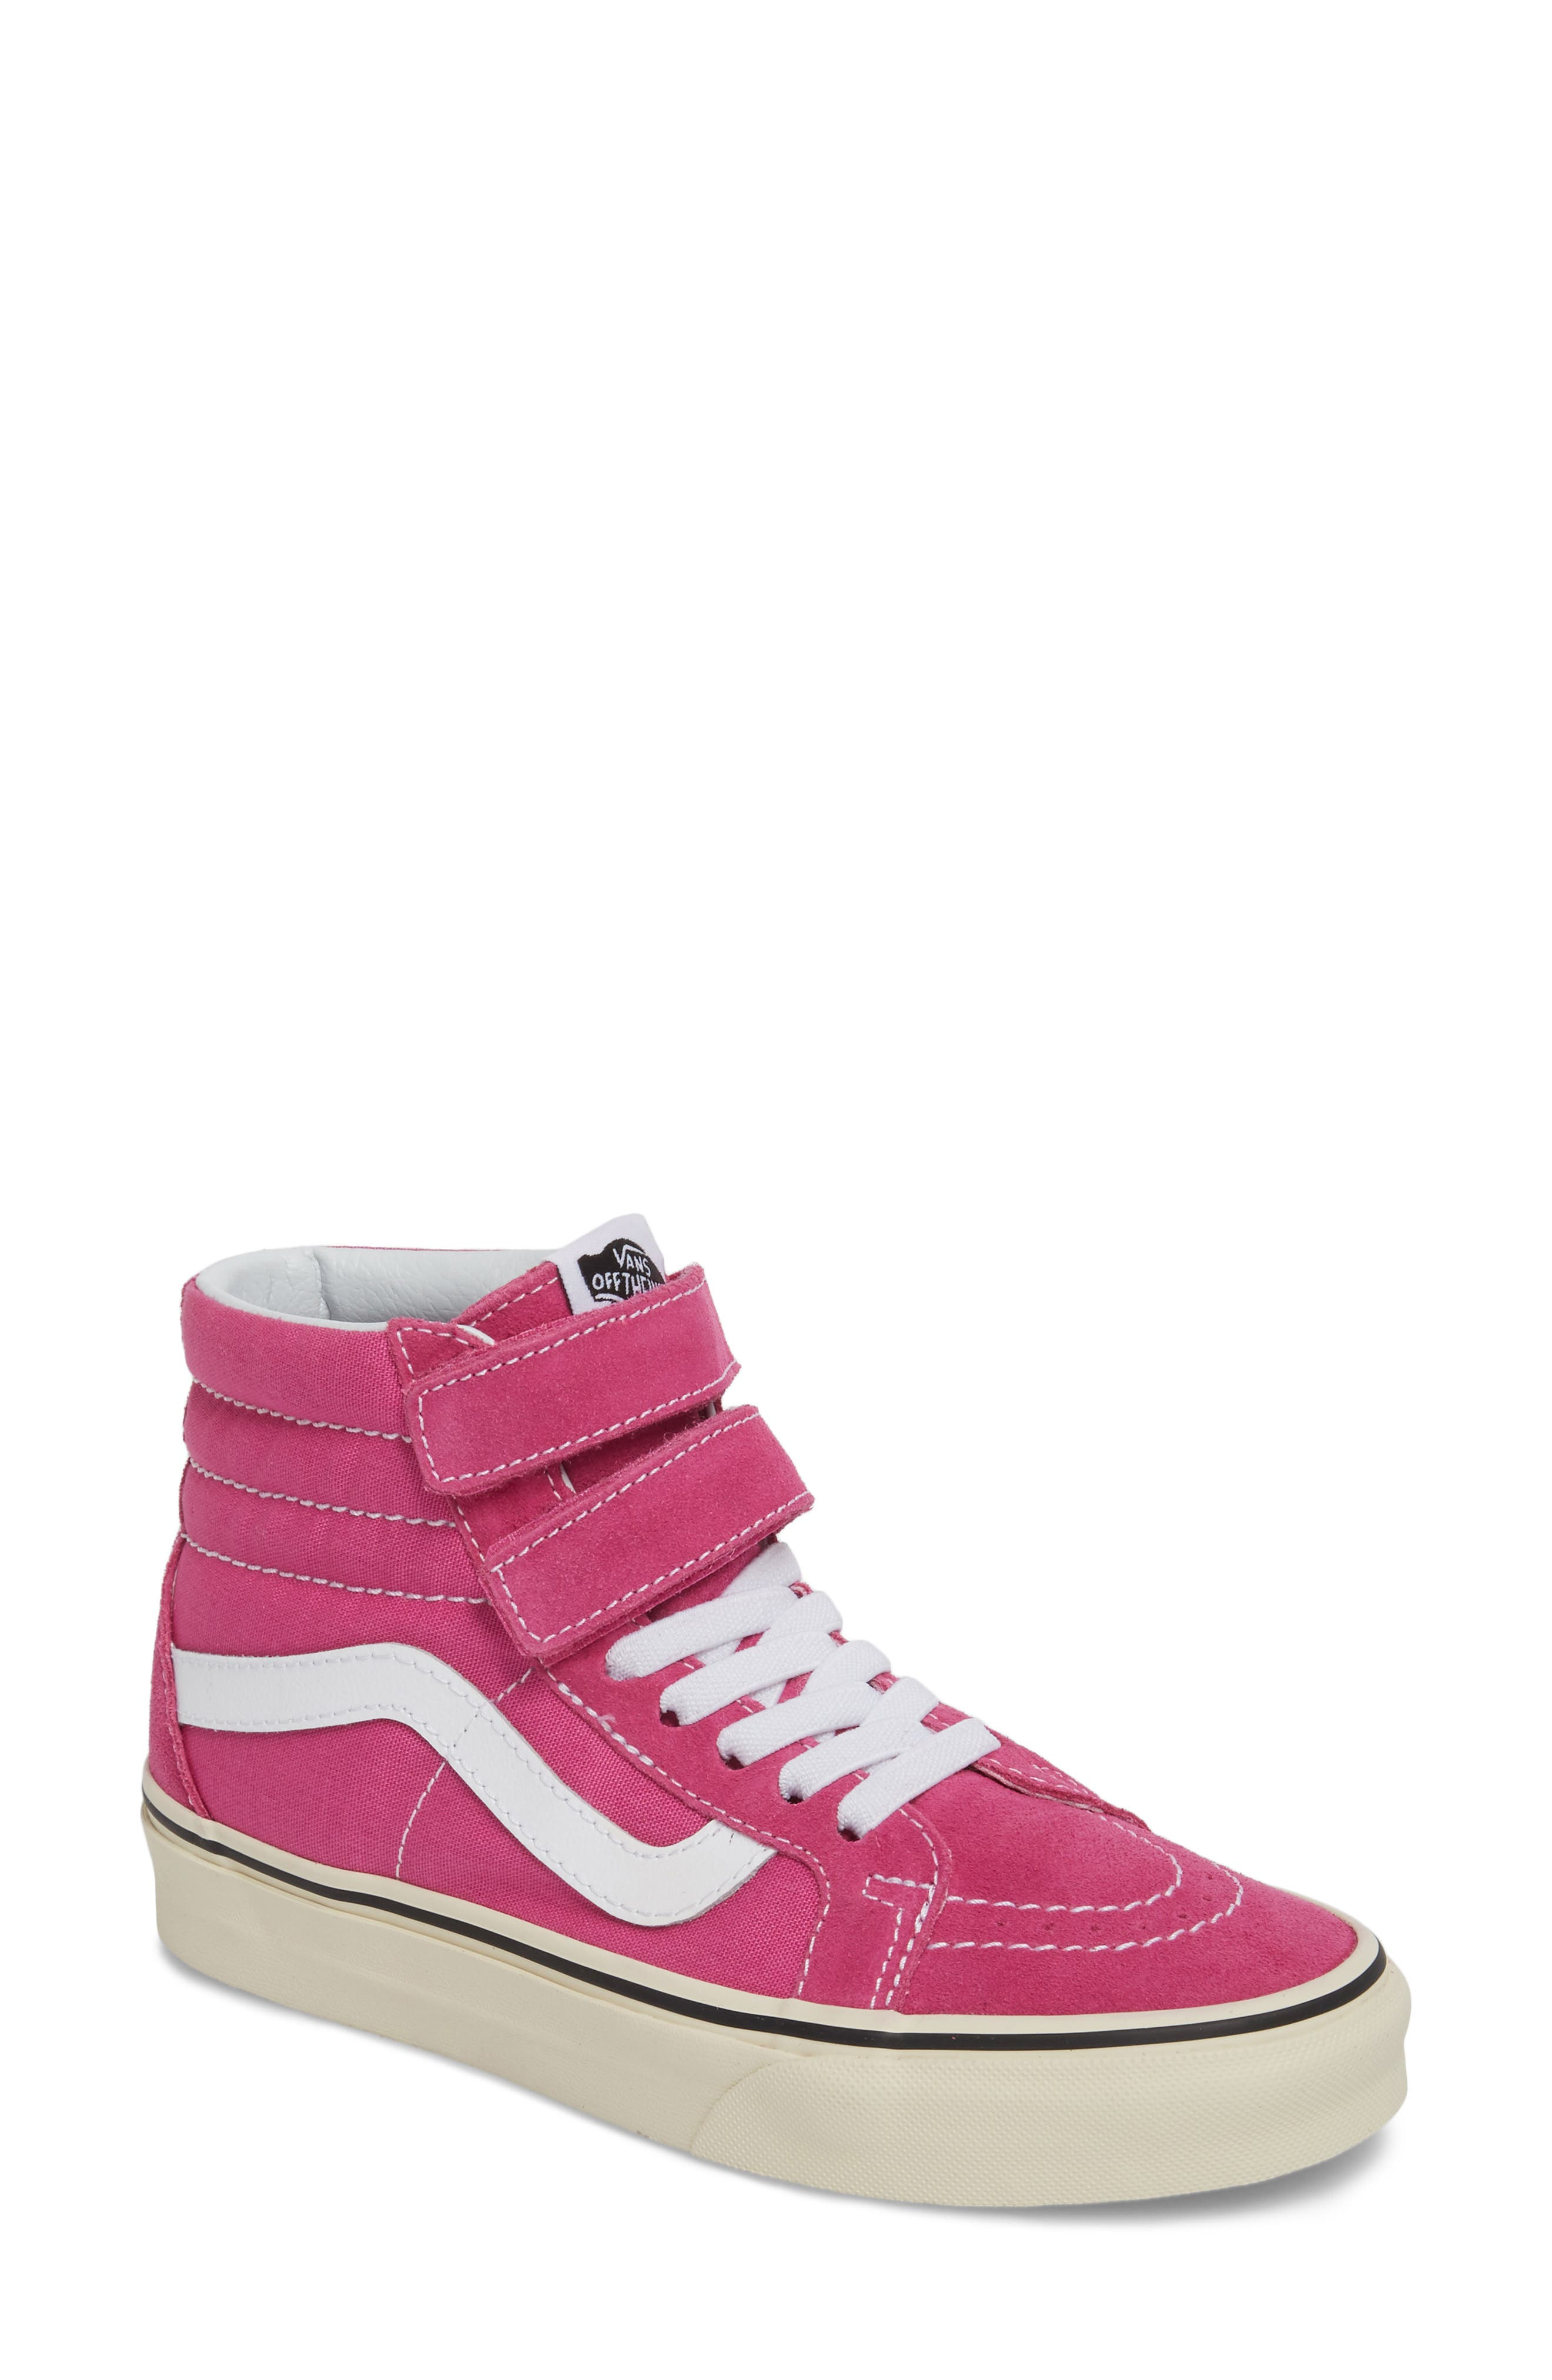 Sk8-Hi Reissue Sneaker,                             Main thumbnail 1, color,                             670